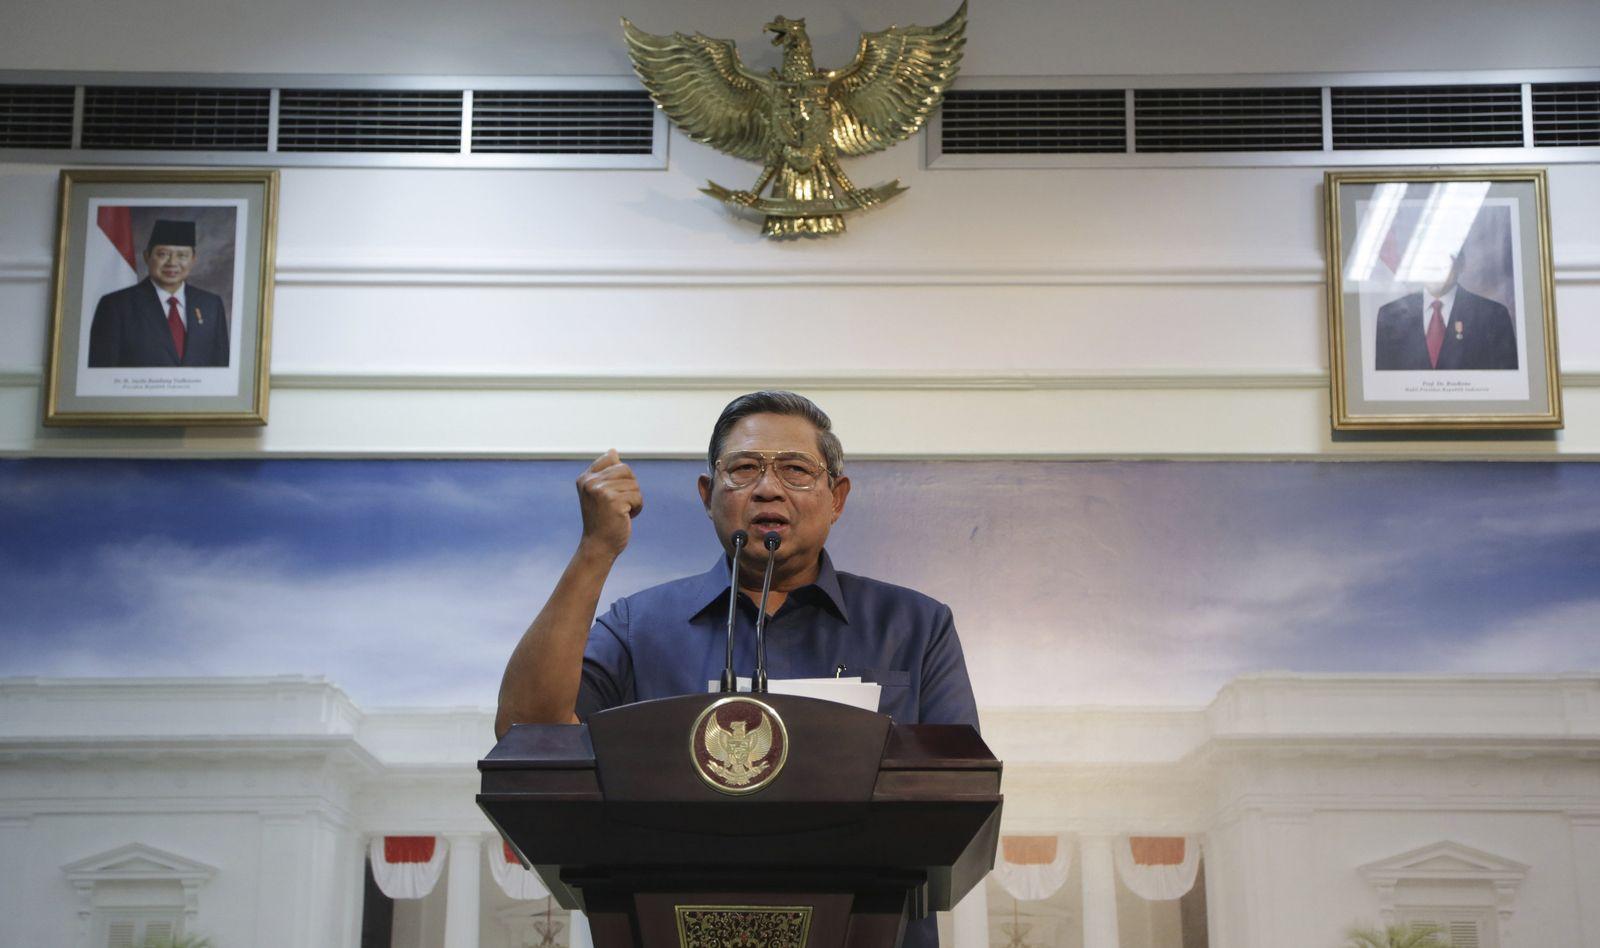 Susilo Bambang Yudhoyono/Indonesien